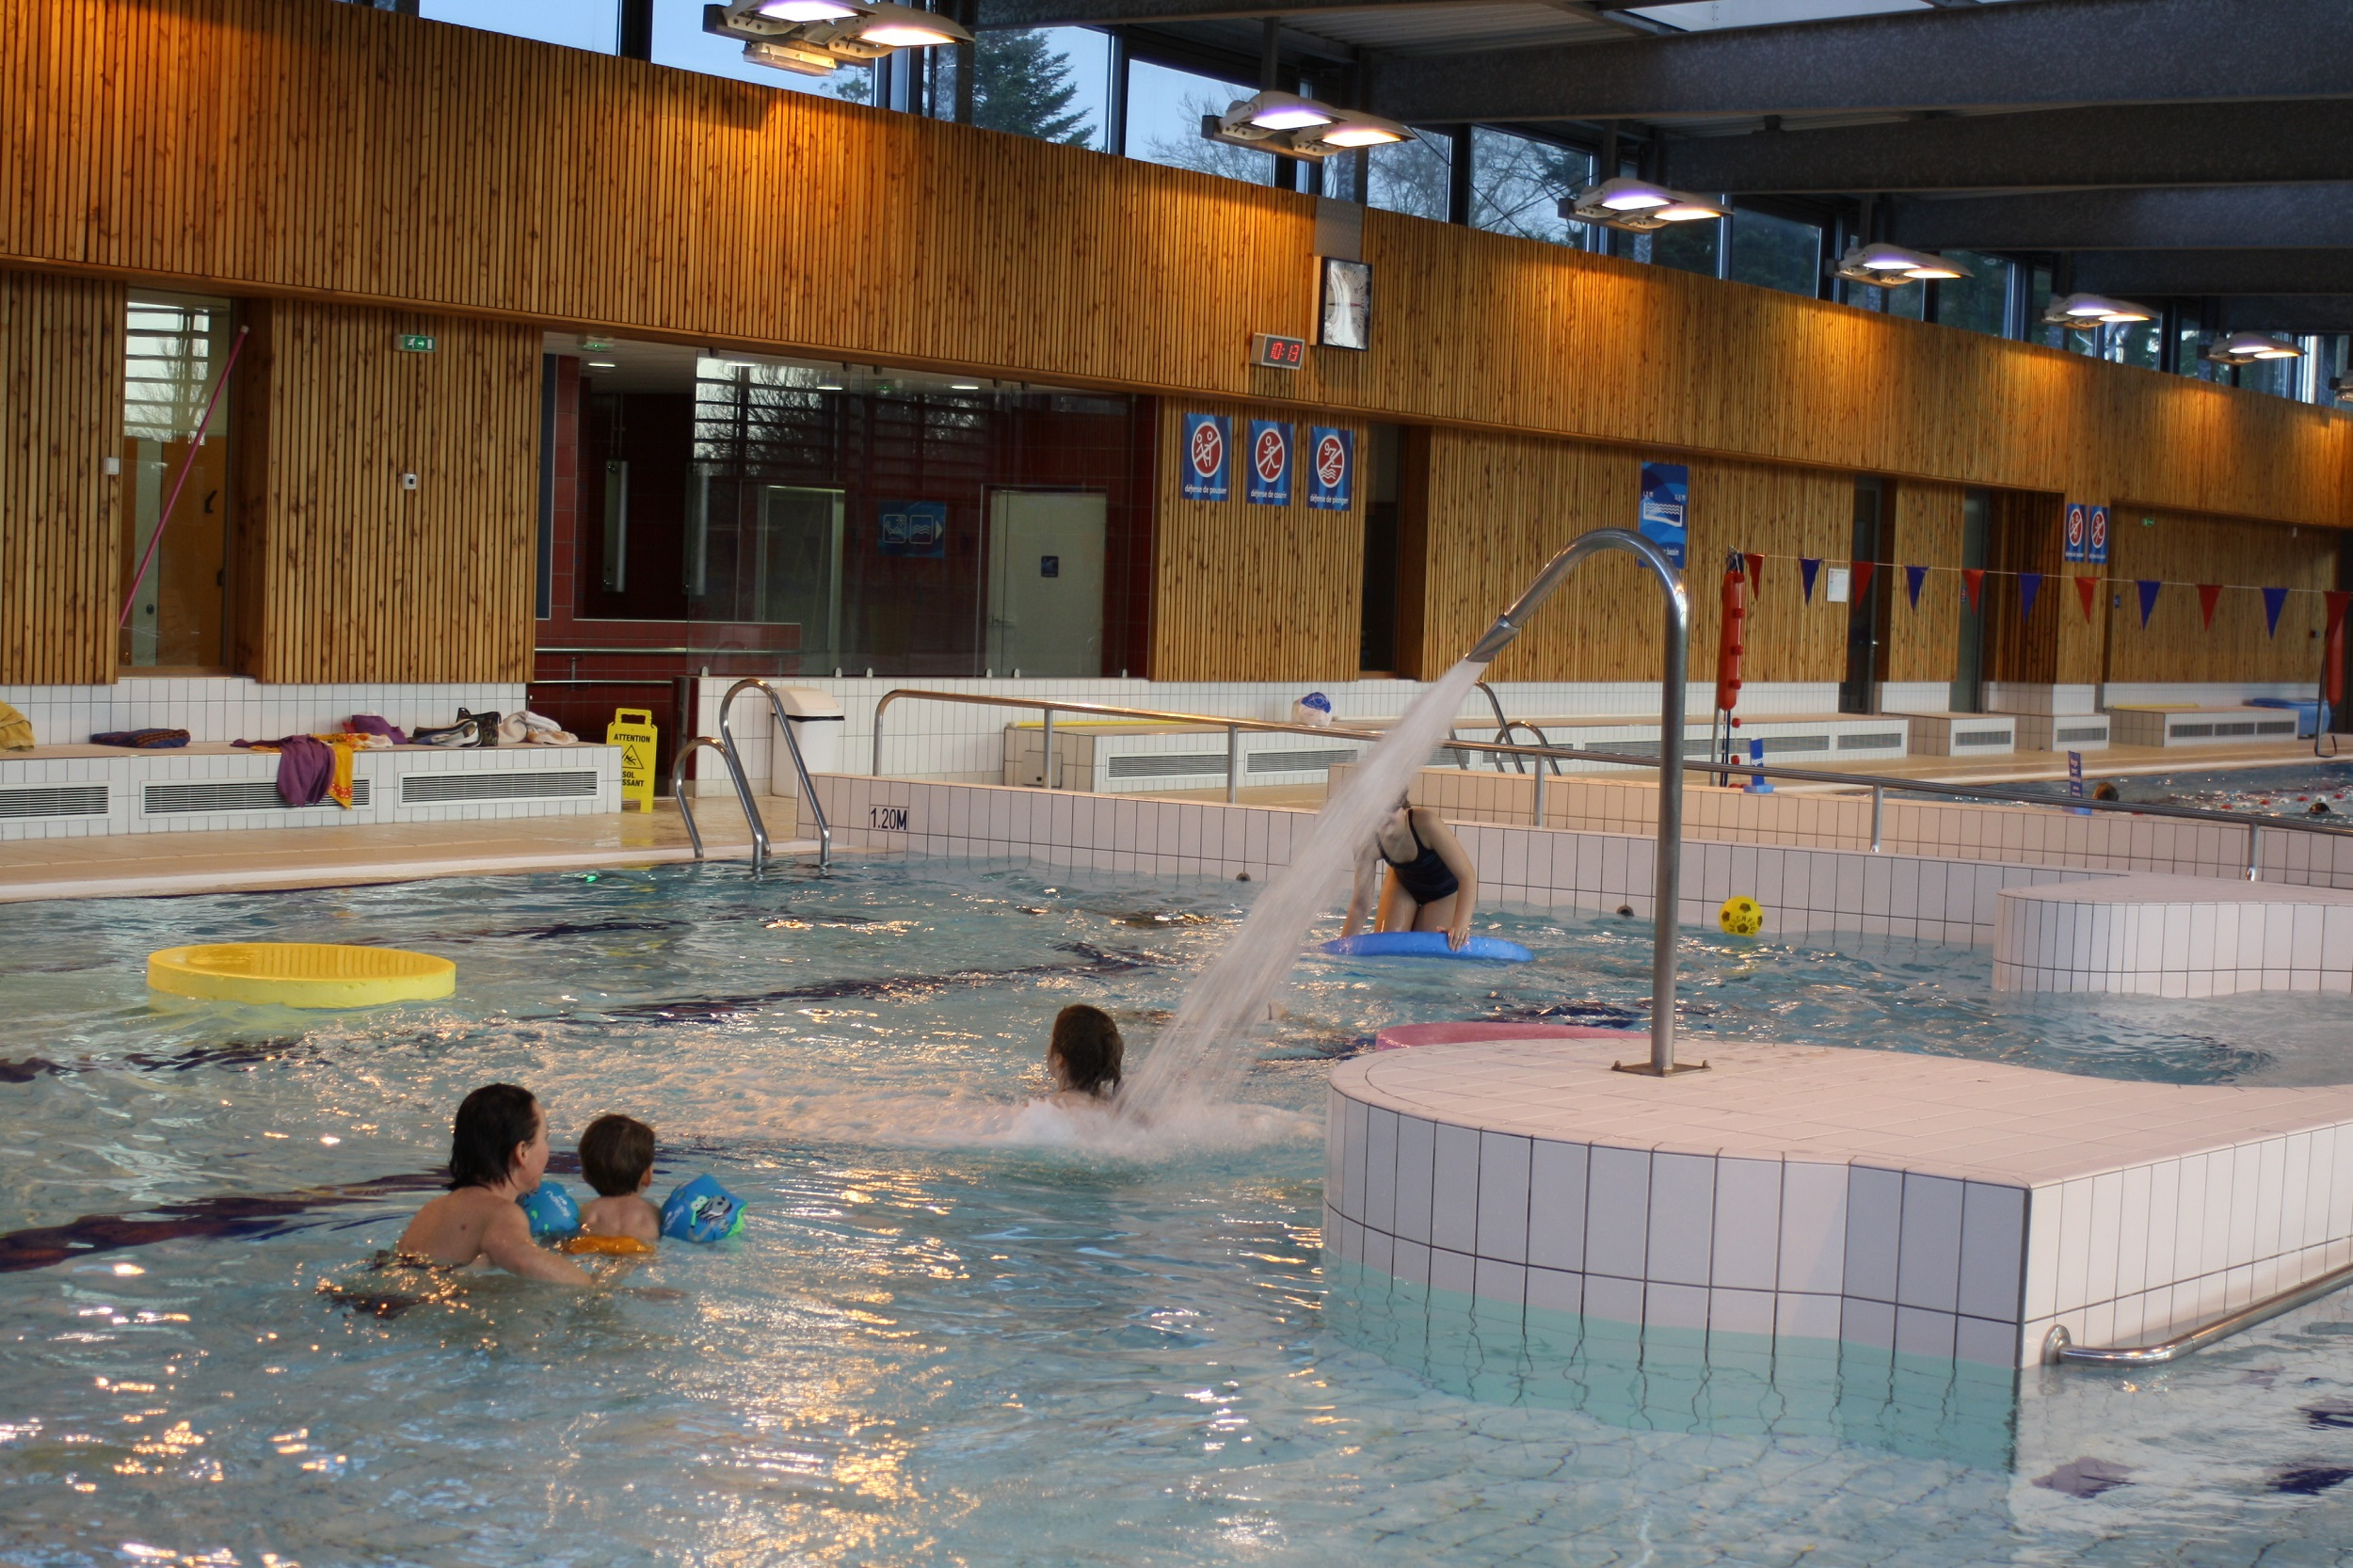 Complexe Aquatique De Kerbihan - Hennebont à Horaire Piscine Hennebont